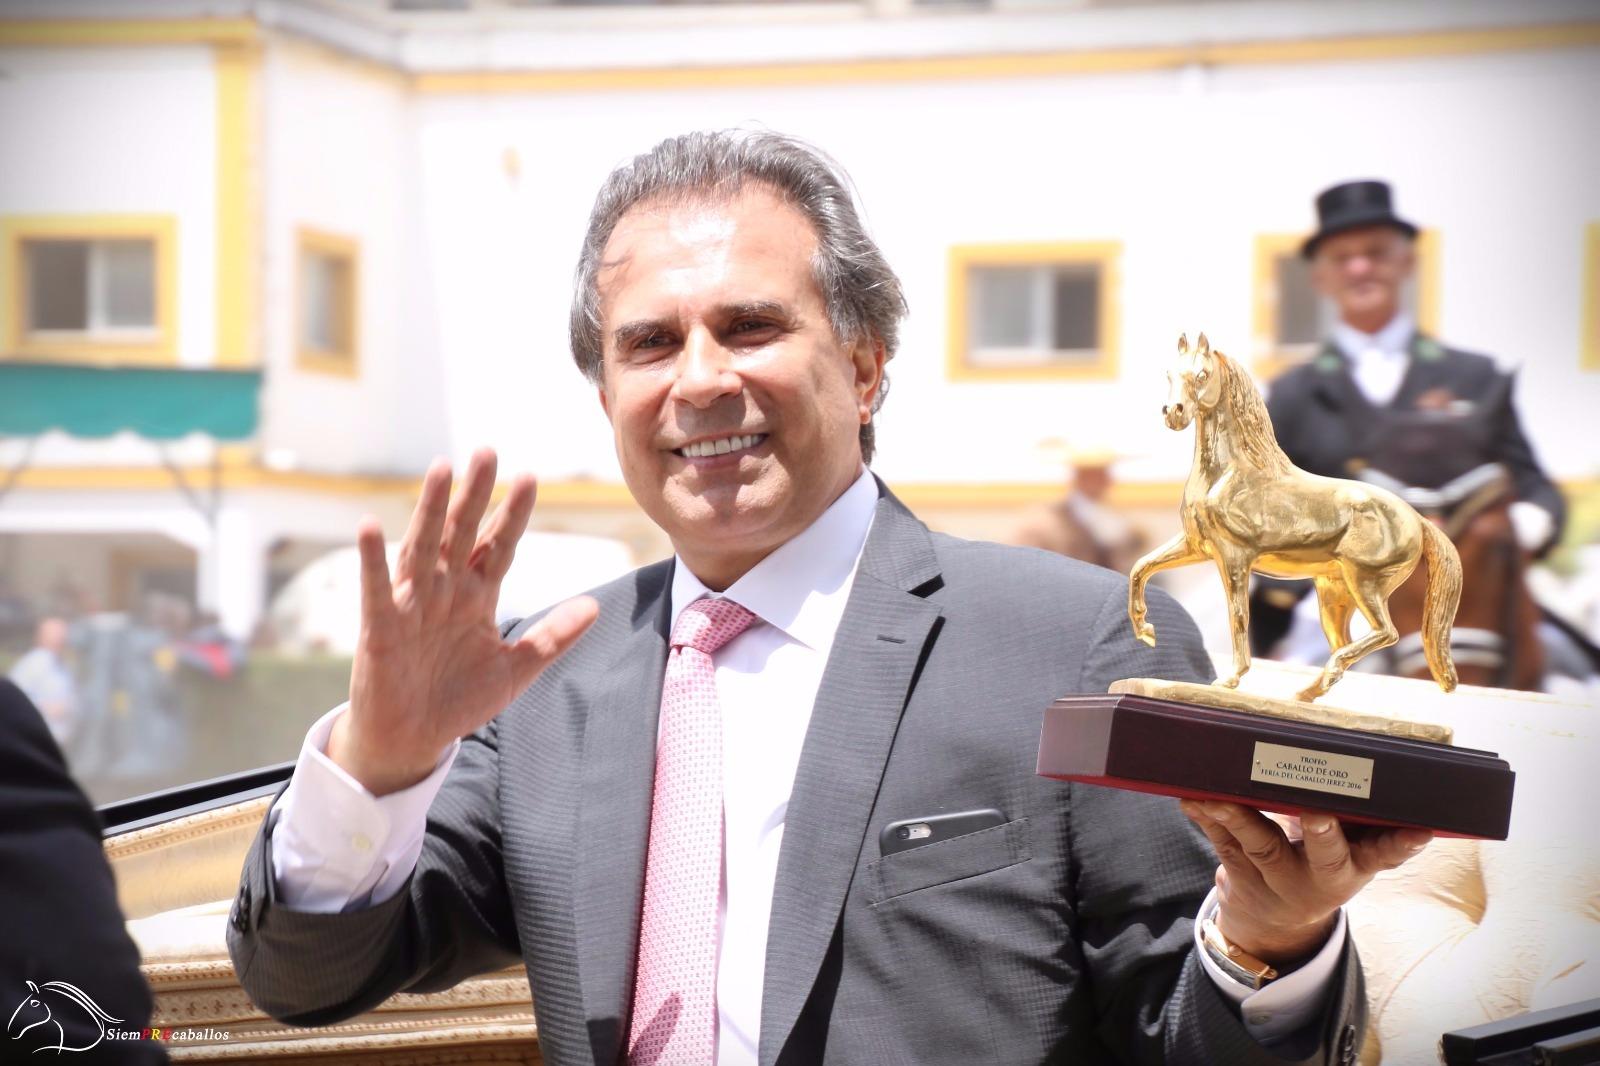 Ceremonia de entrega del Caballo de Oro 2016 a D. ABELARDO MORALES.